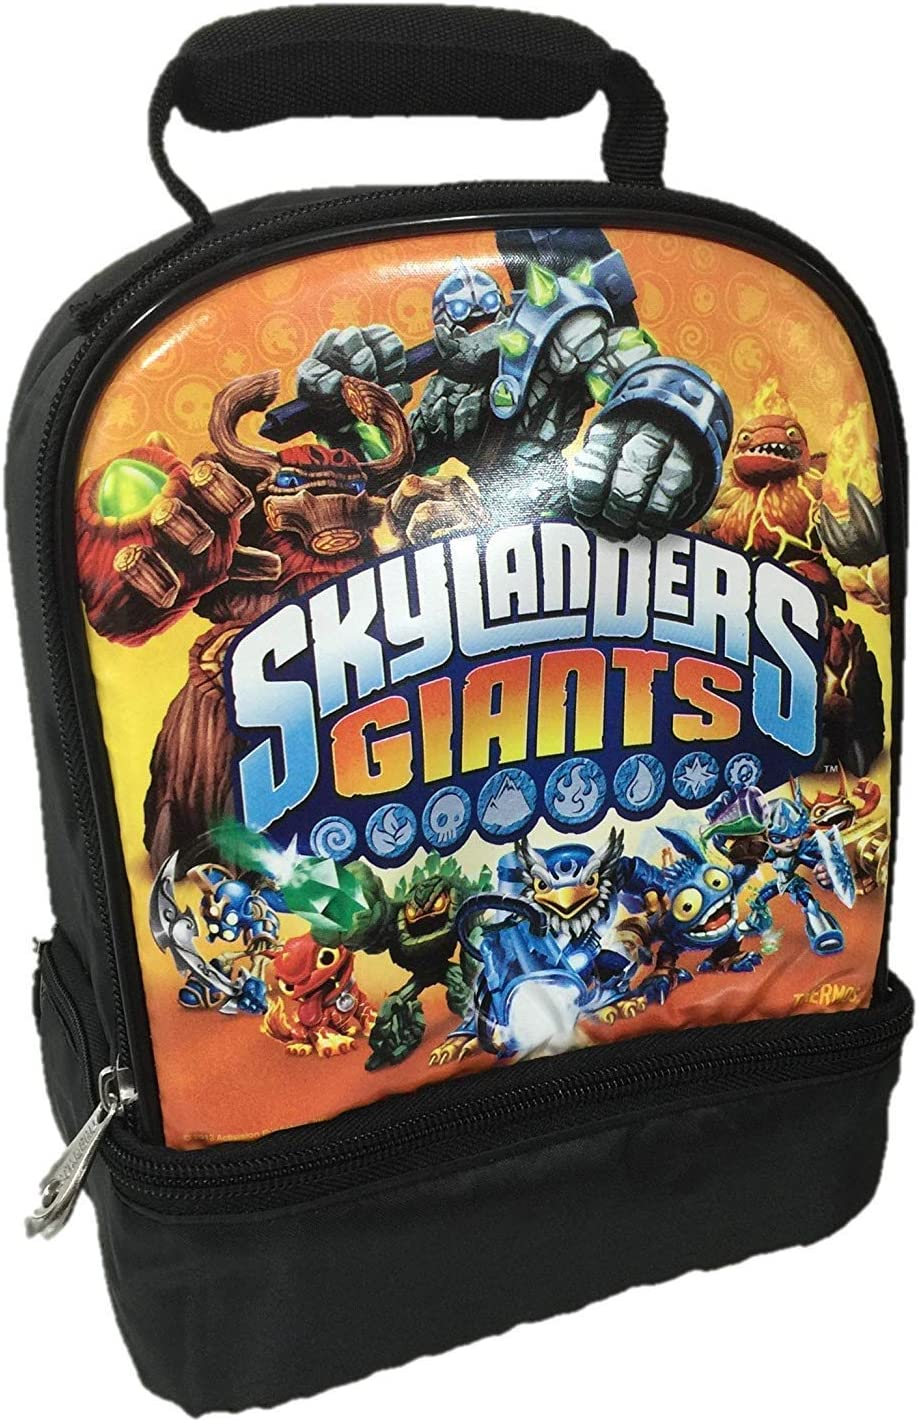 Thermos SKYLANDERS GIANTS Dual Lunch Kit, 7.5 W x 5 D x 9.5 H Inch